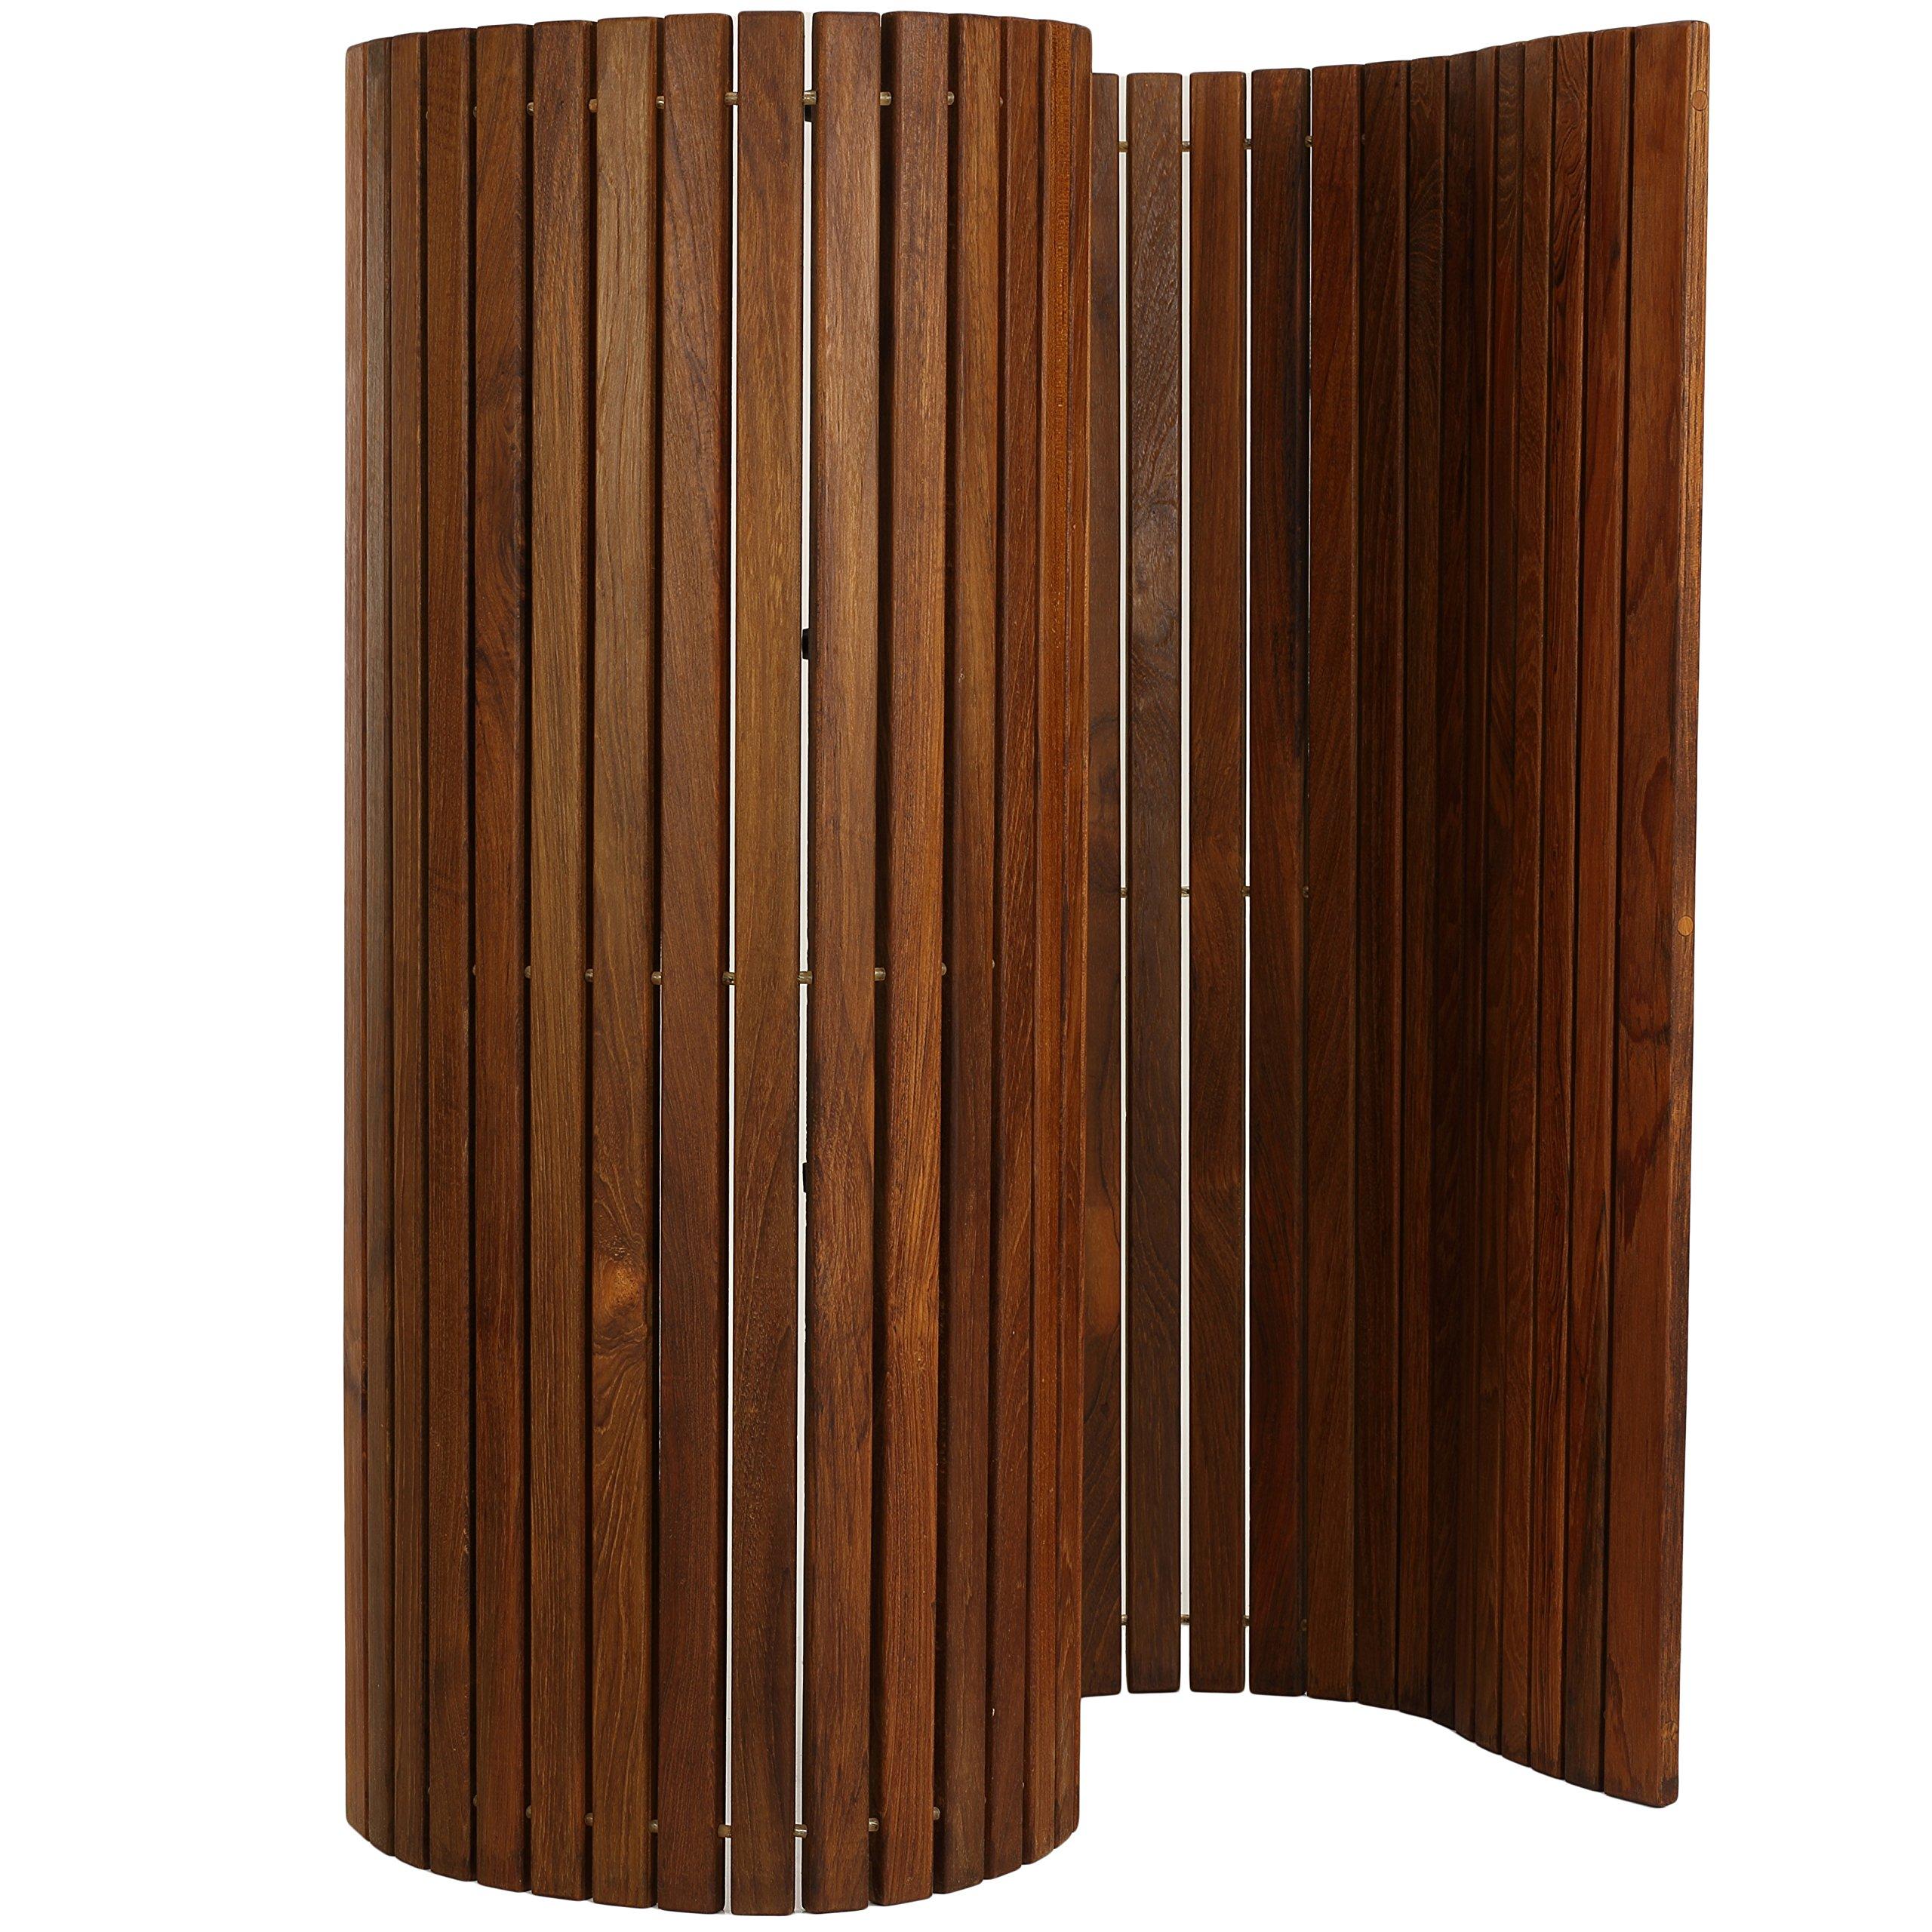 Bare Decor 3 by 5' Oskar String Spa Shower Mat/Rug, X-Large, Solid Teak Wood Oiled Finish by Bare Decor (Image #2)